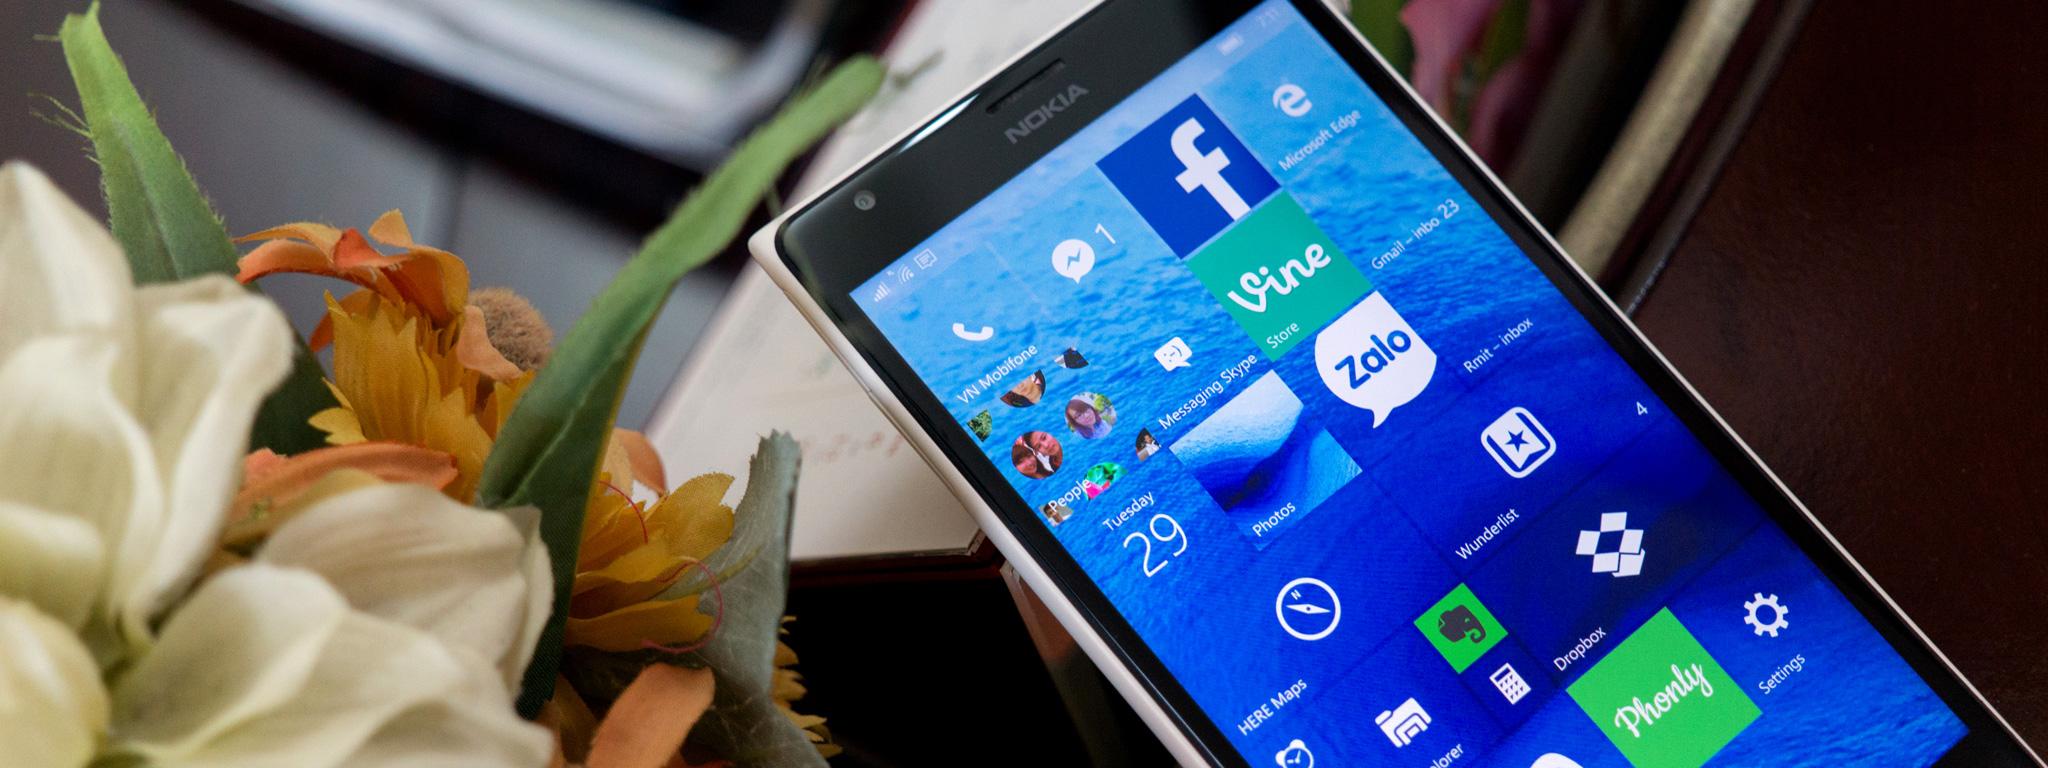 cv_Microsoft_Windows_10_Mobile_Creators_Update_Lumia_1520_930.jpg